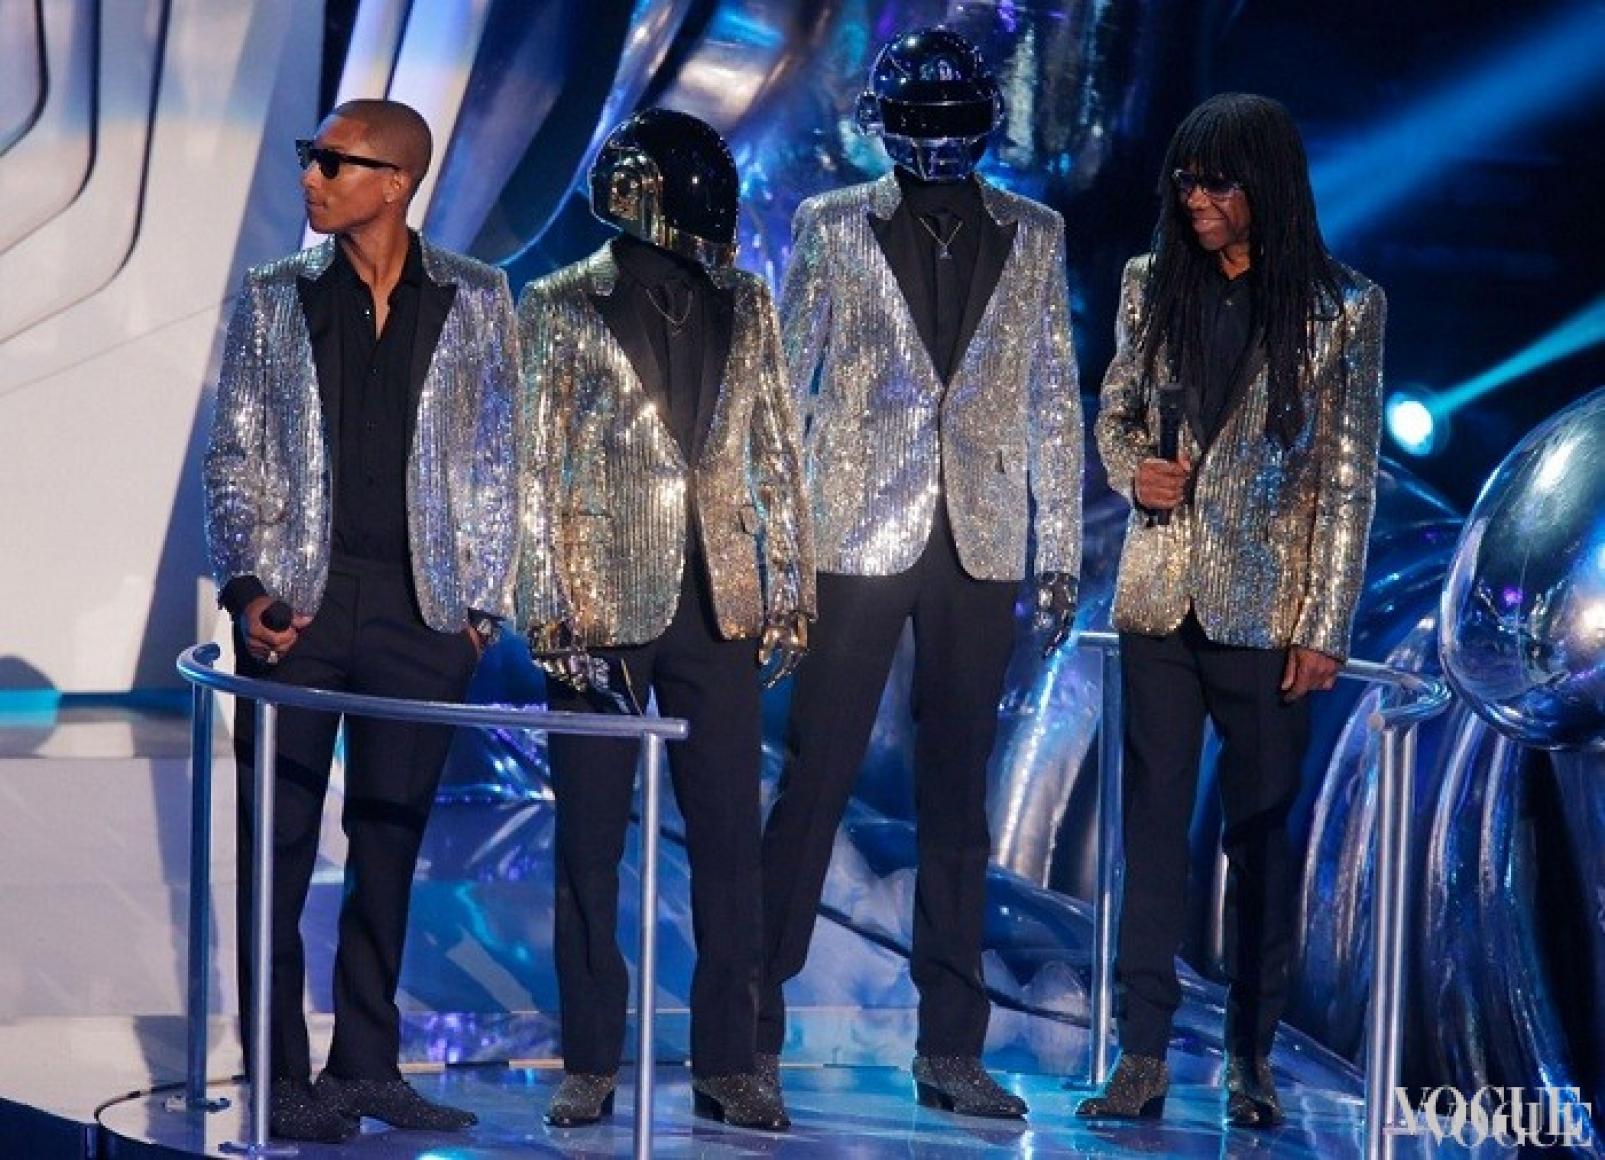 Фаррелл Уильямс, Daft Punk и Найл Роджерс в жакетах Saint Laurent, 2013